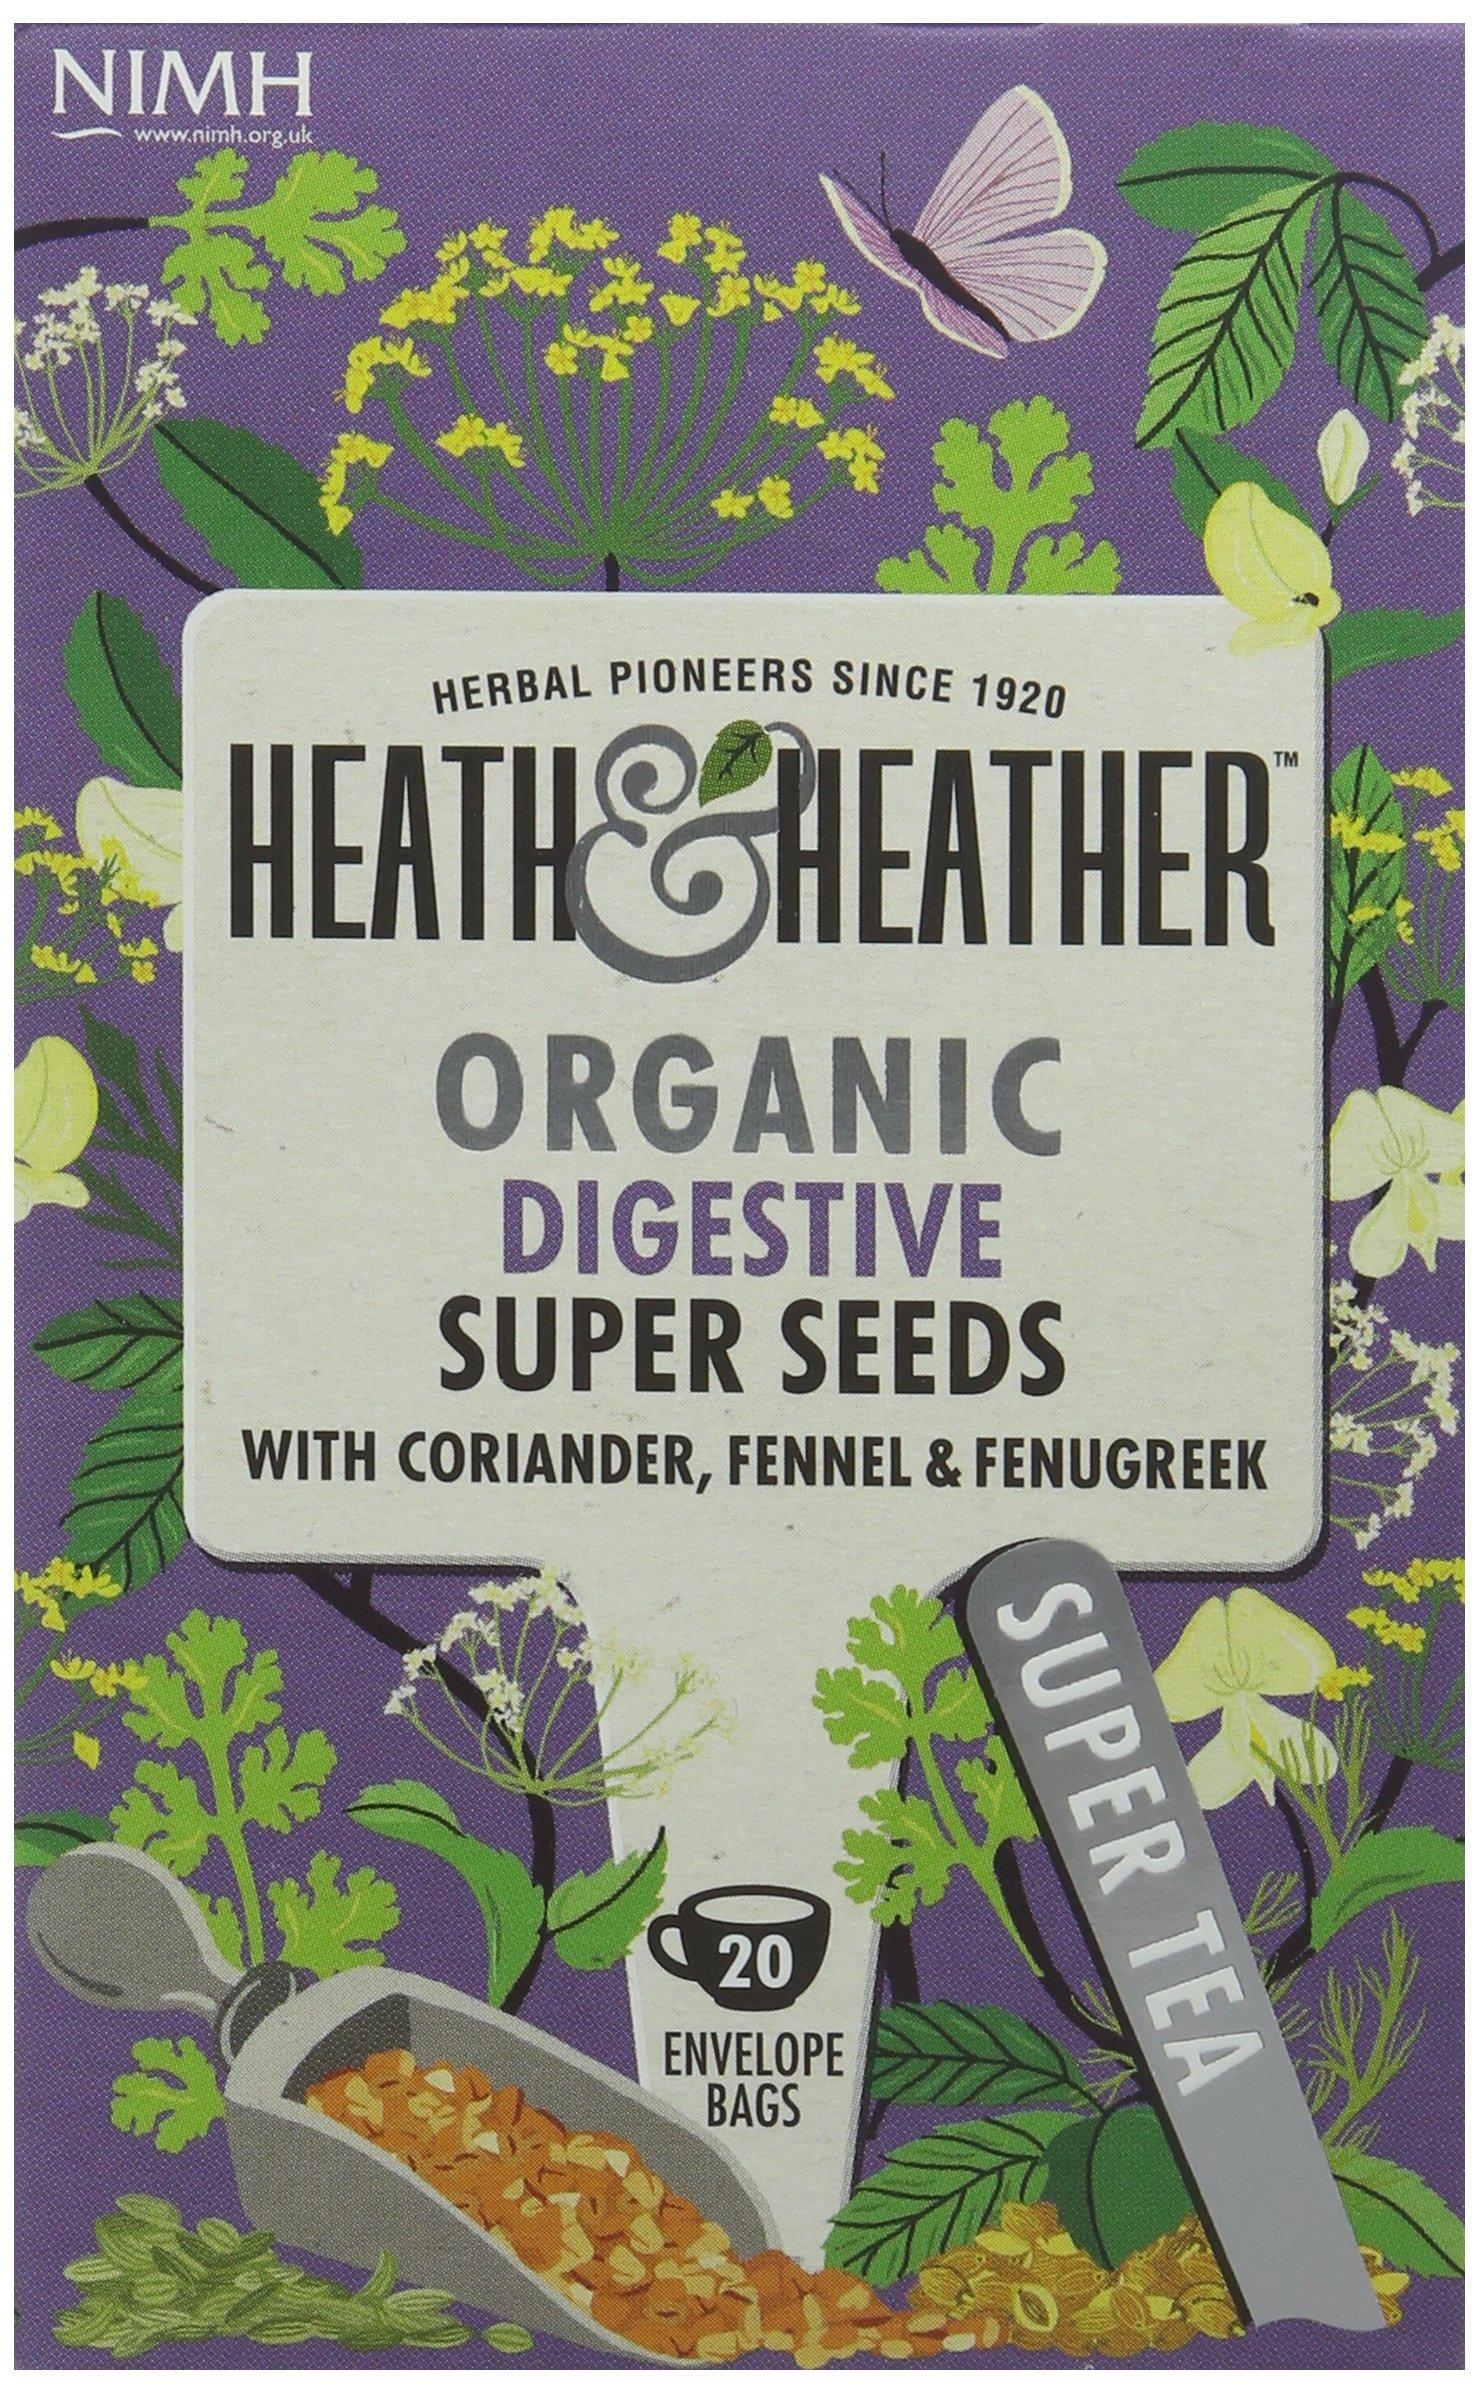 Heath & Heather health tea tea bundle (soil association) (infusions) (6 packs of 20 bags) (120 bags) (a vegetal tea with aromas of aniseed, coriander, fennel, fenugreek) (brews in 3-5 minutes)